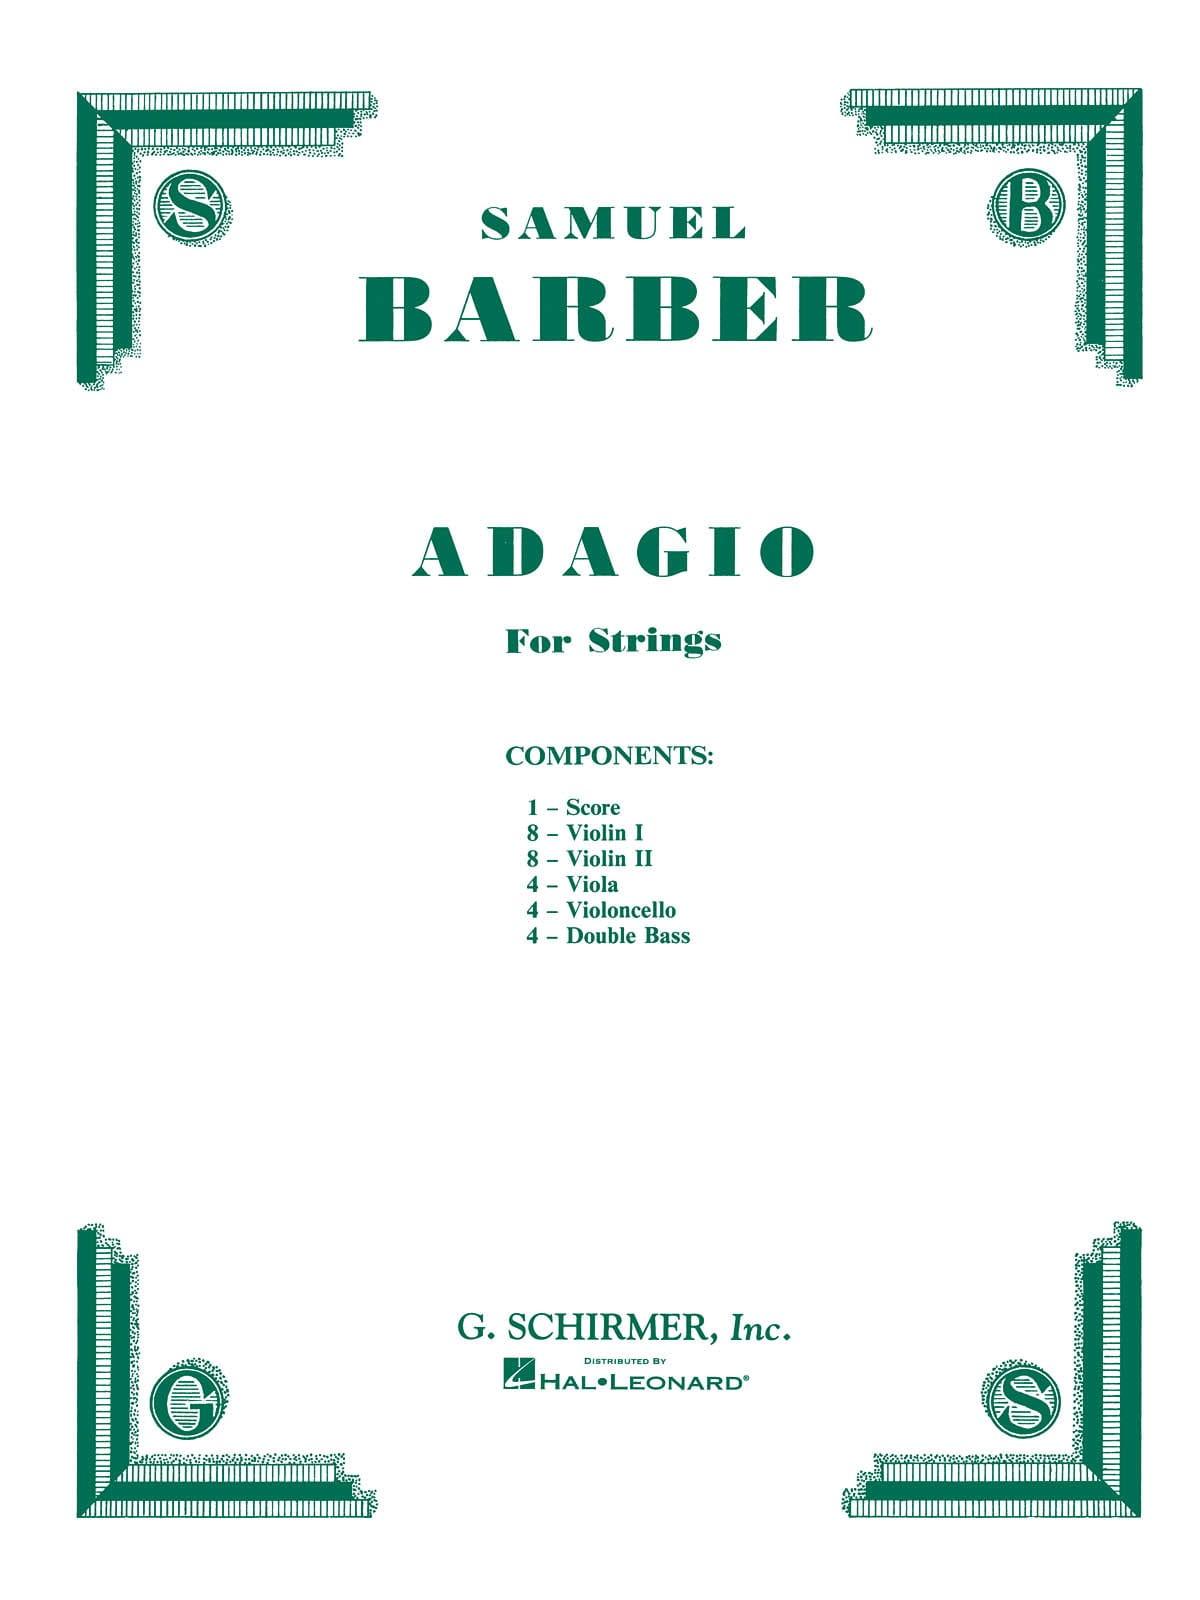 Adagio Pour Cordes - Set Complet - BARBER - laflutedepan.com